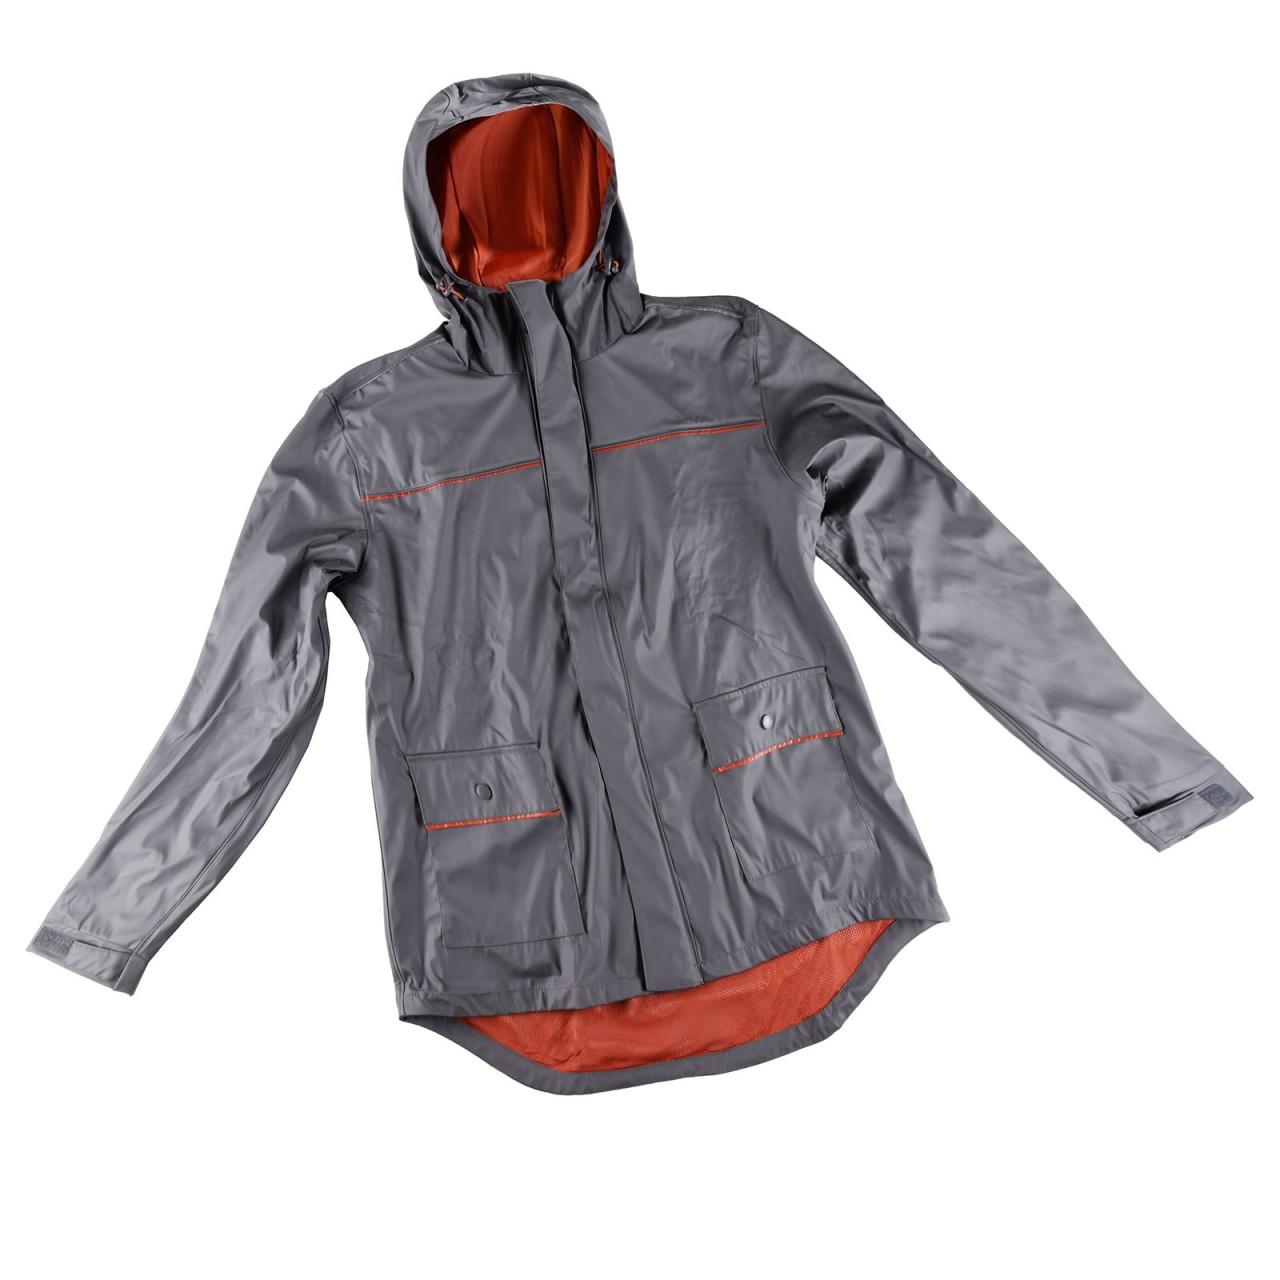 work rain jacket outdoor jacket windbreaker in different. Black Bedroom Furniture Sets. Home Design Ideas